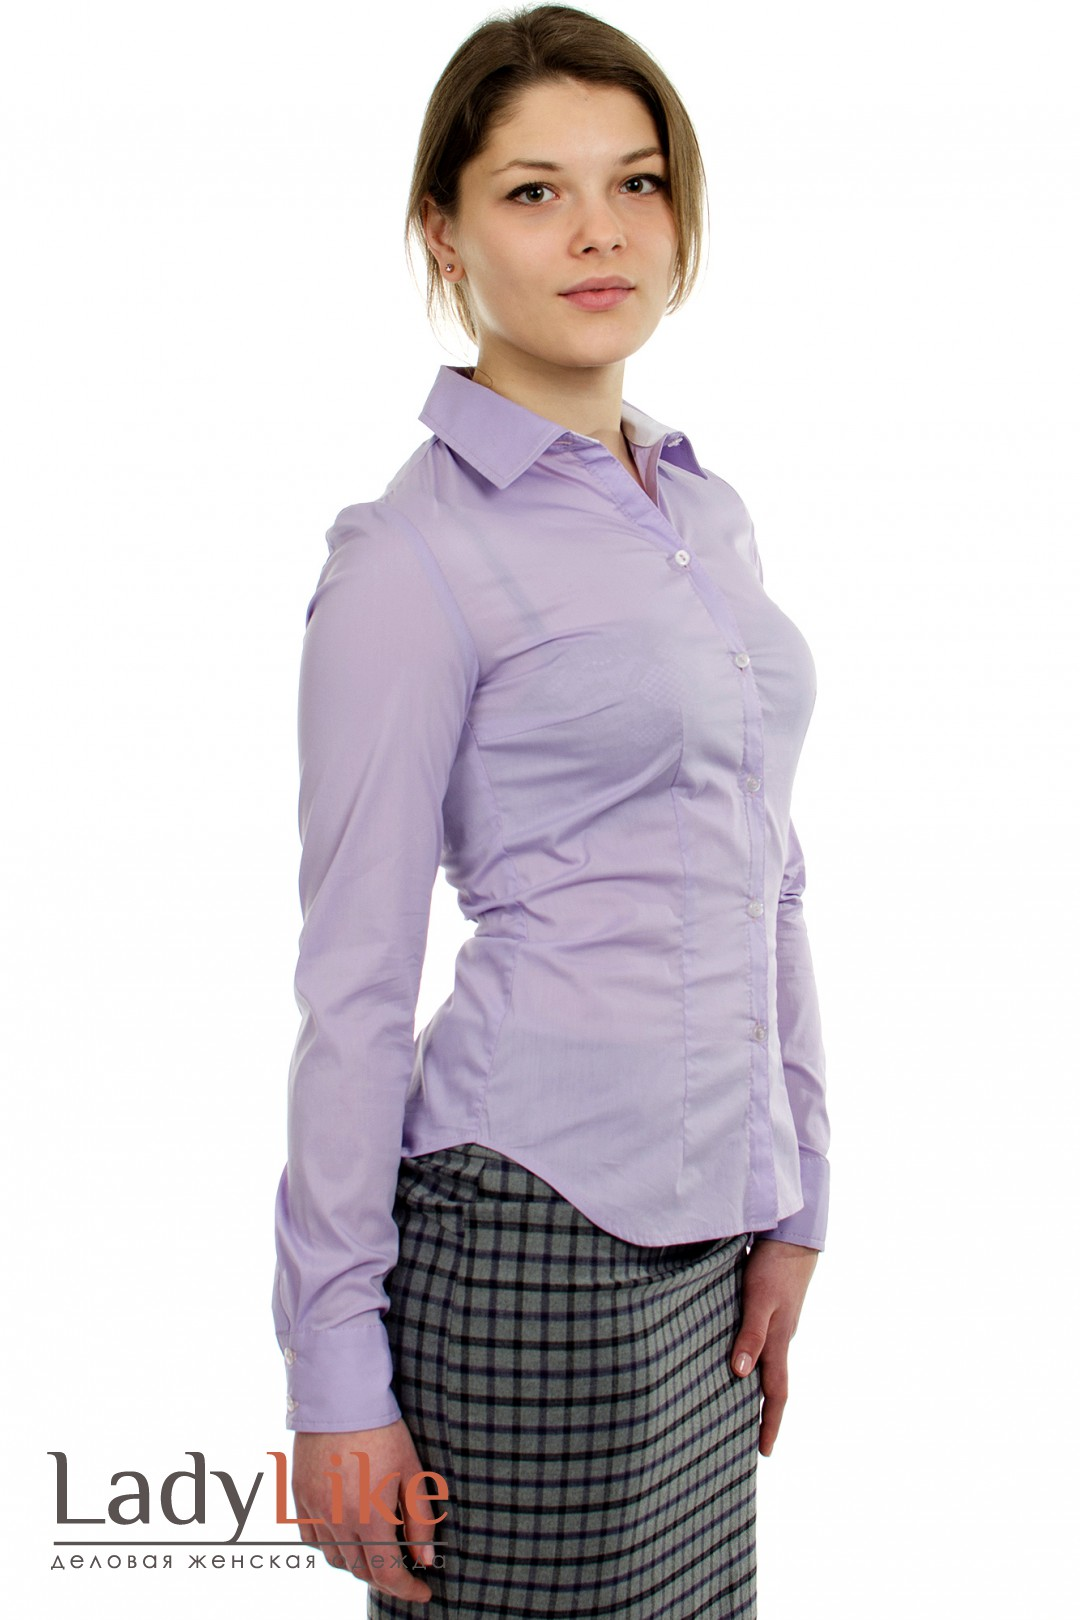 Классические Блузки Женские В Самаре